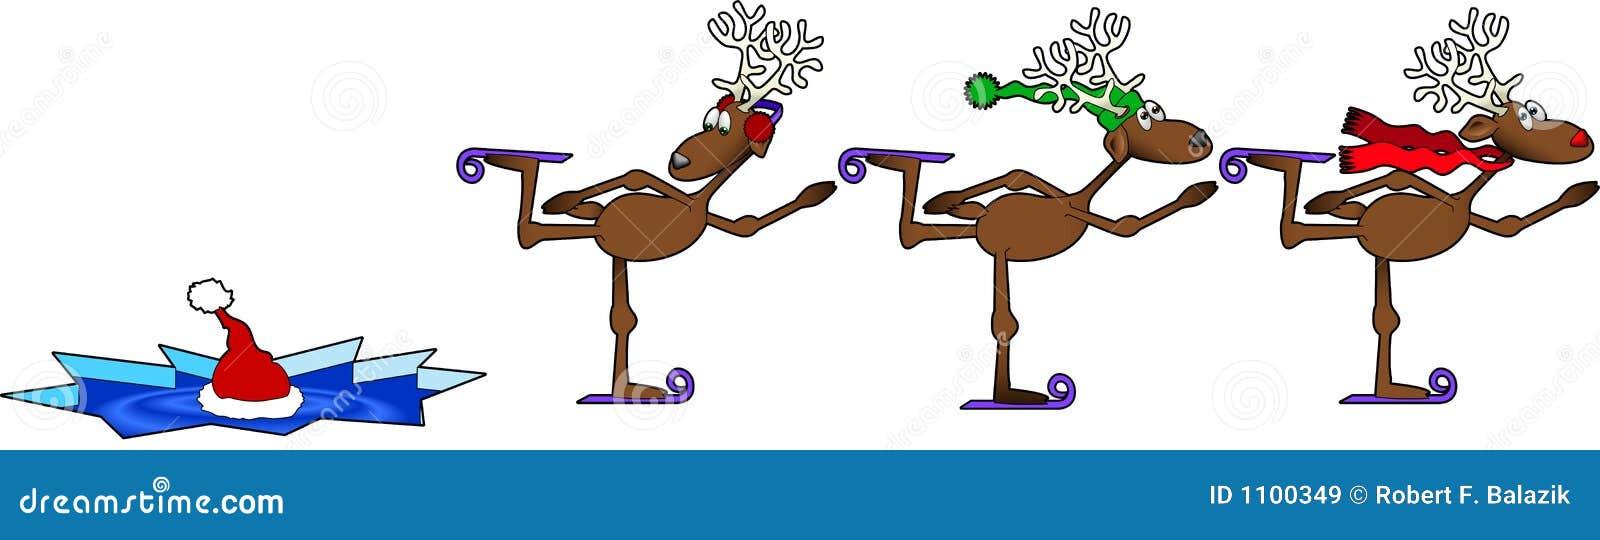 skating reindeer stock vector image of humor  santa ice skates clipart ice skate clip art pictures